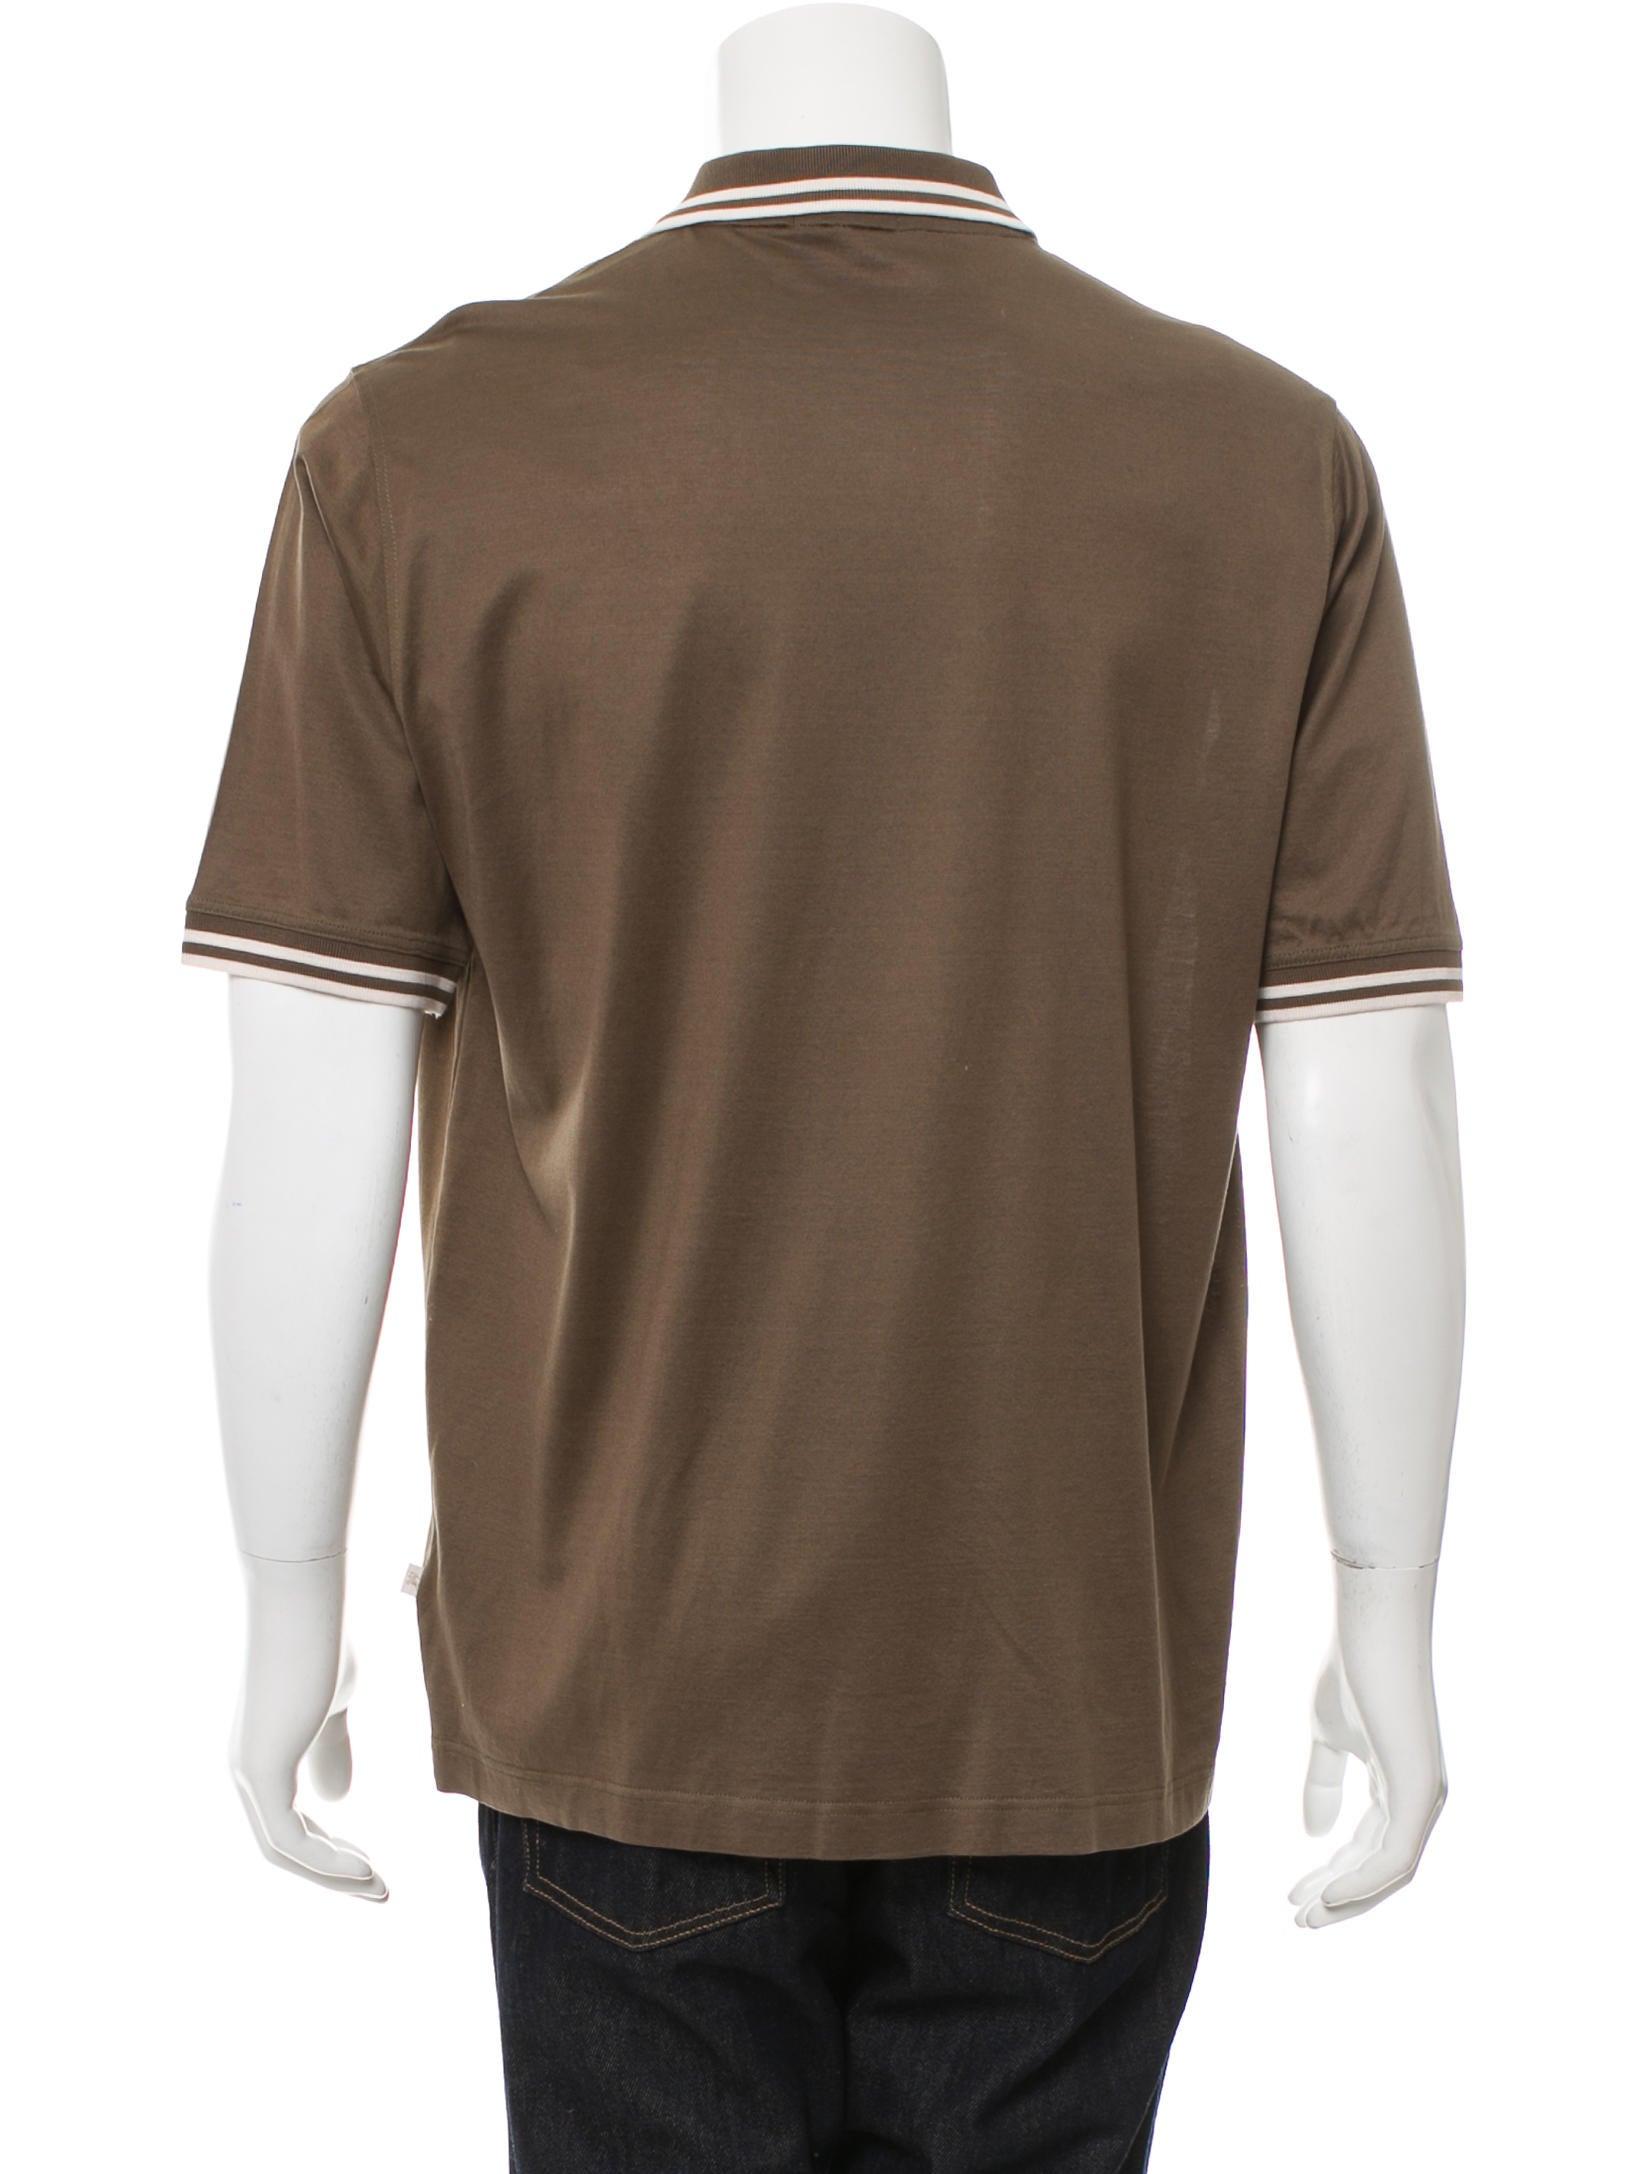 Burberry London Short Sleeve Polo Shirt Clothing